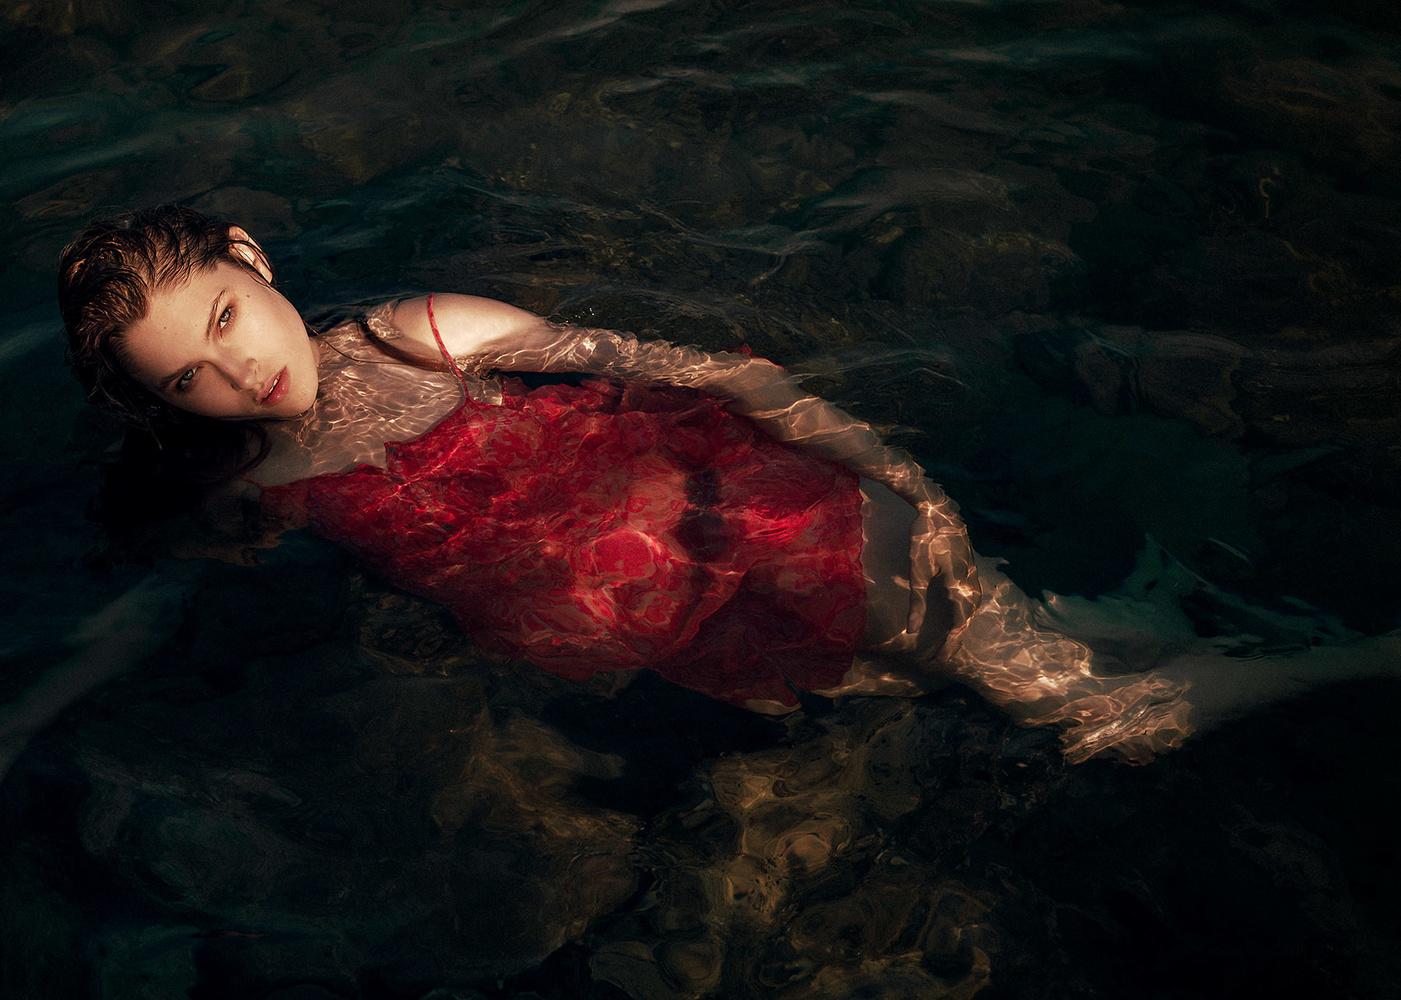 Liana by Tasos Anestis